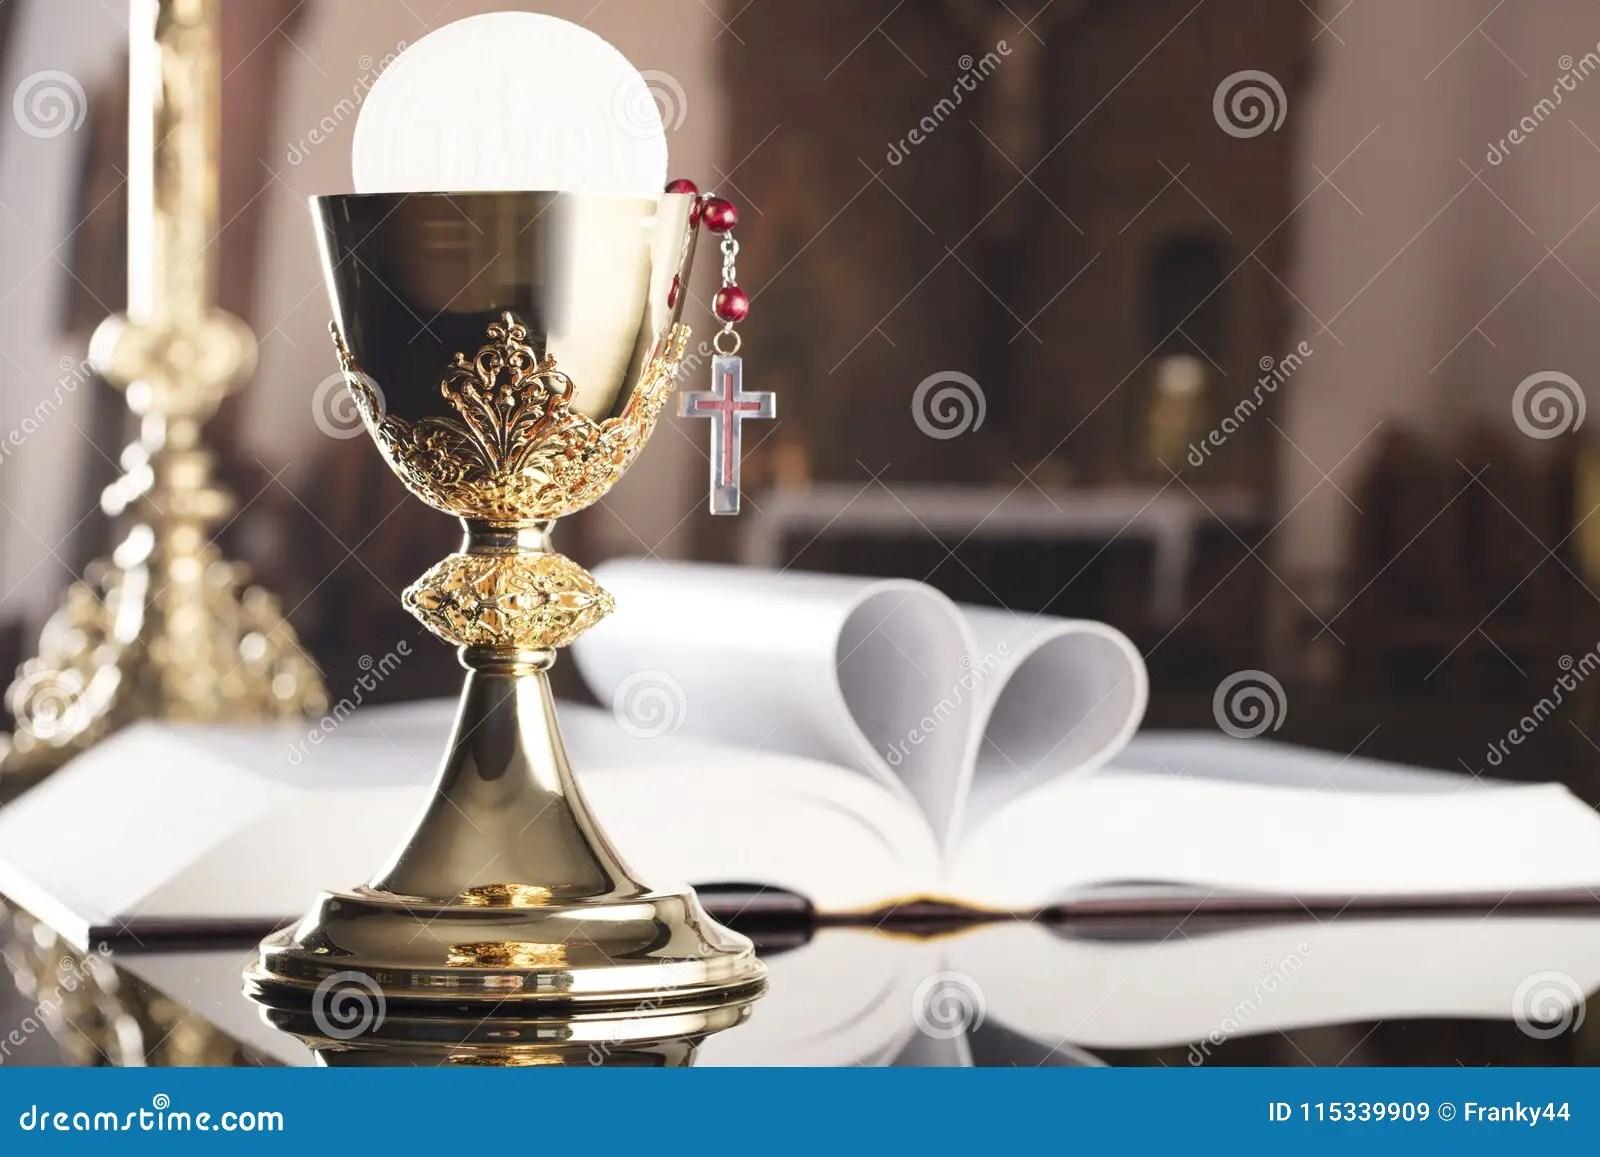 First Holy Communion Theme Catholic Concept Background